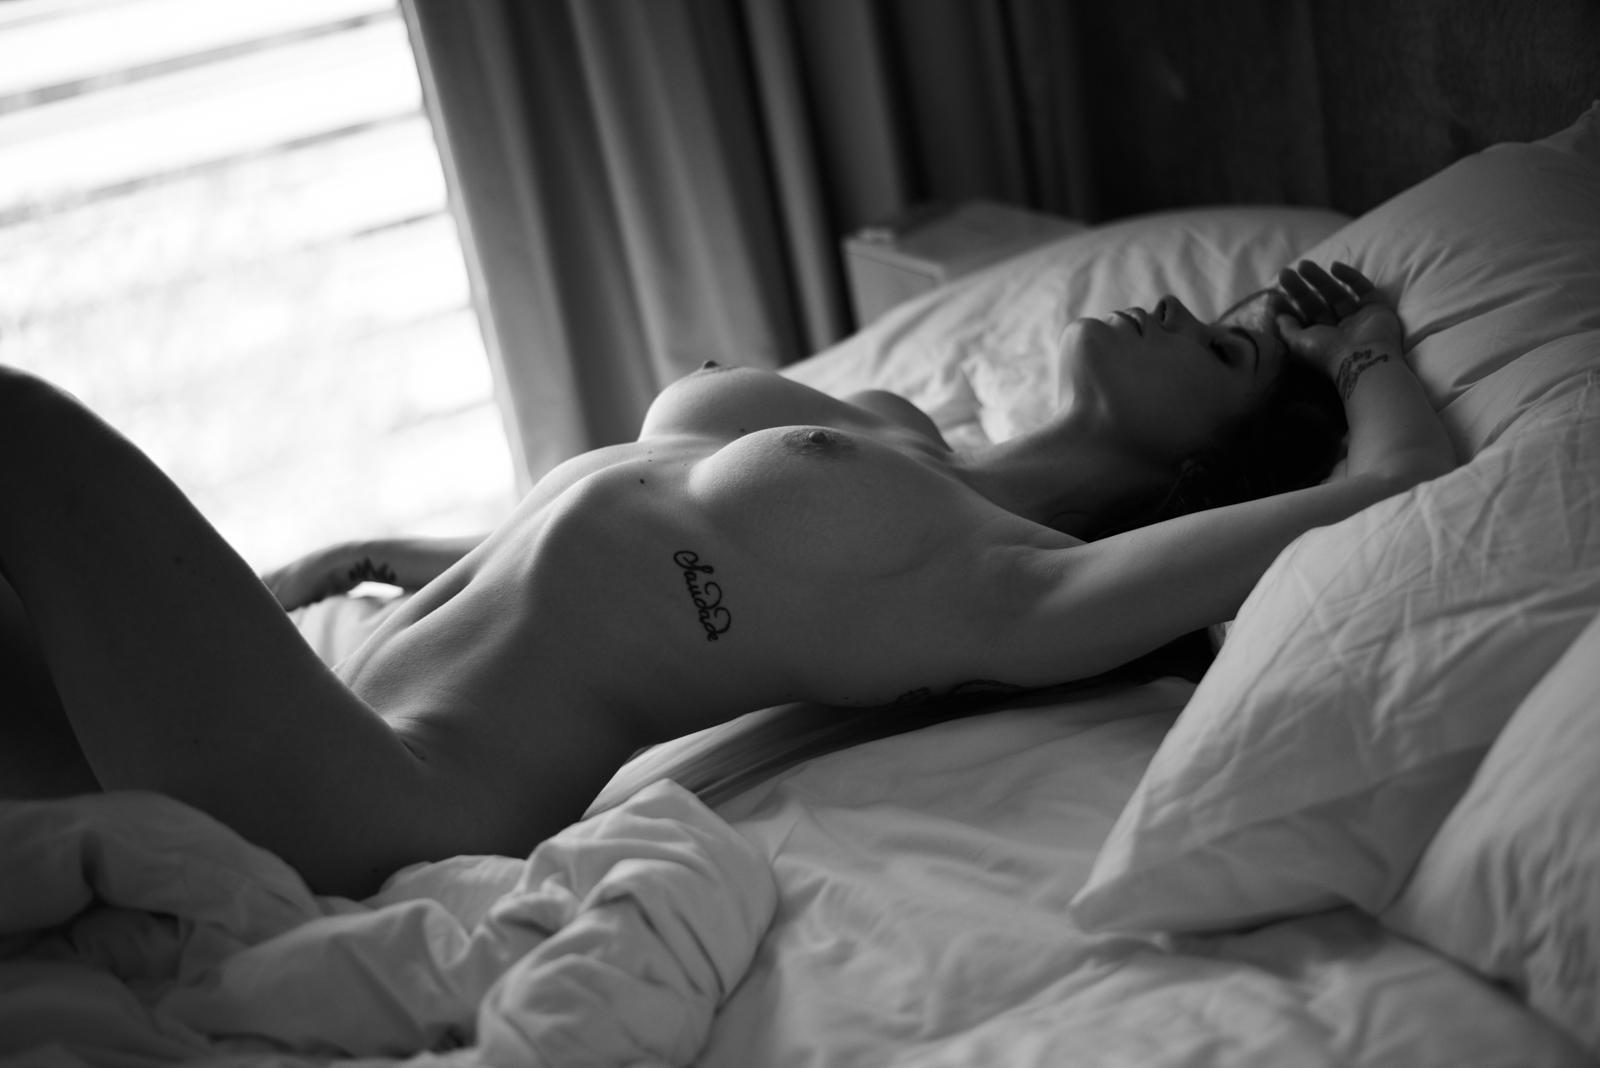 I Miss You So Women  photoshooting photoshoot photography photographer nudes nude art nude models model lionsmag lions magazine lingerie body art blackandwhite beach babes artwork art   // lionsmag.com - premium nude photography magazine